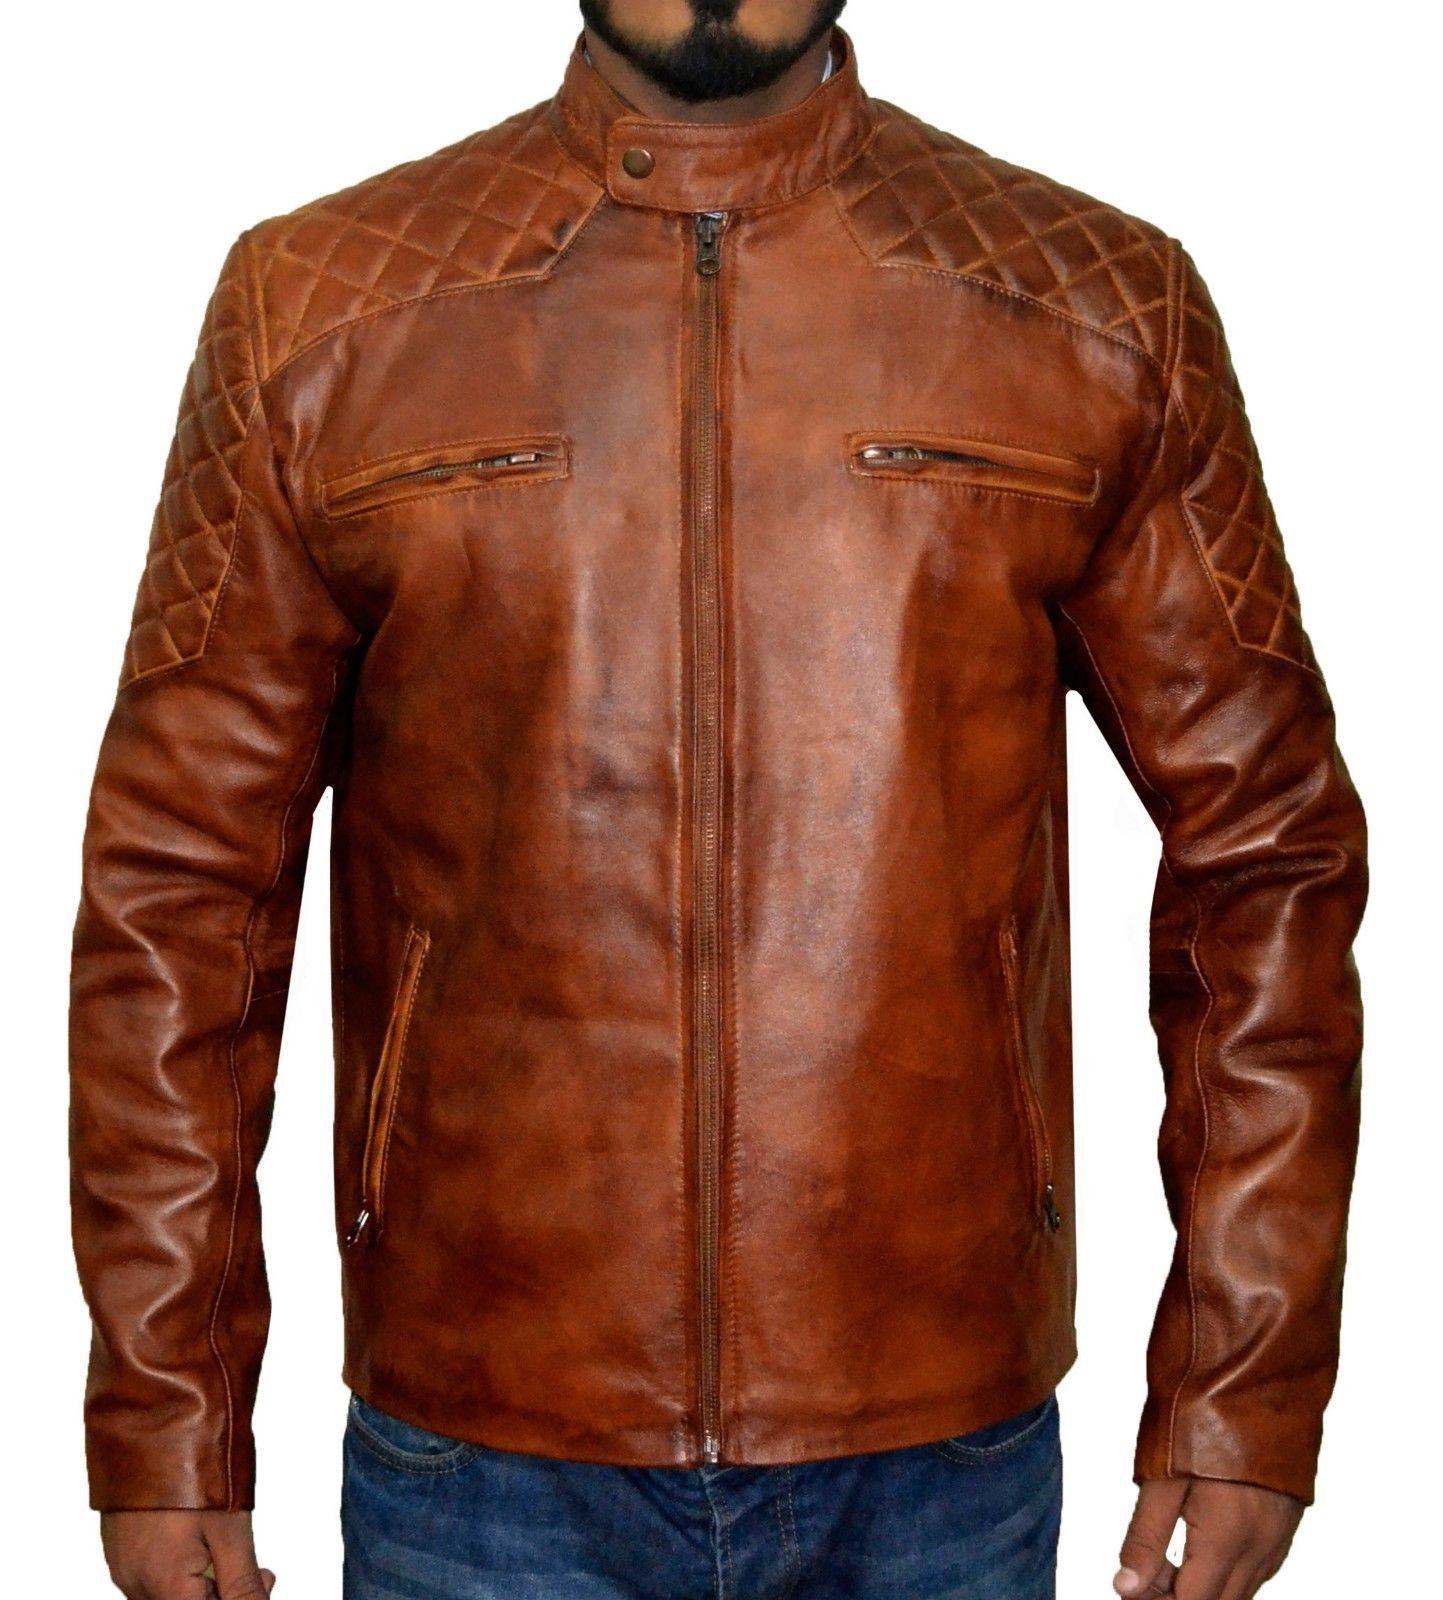 New Mens Leather Jacket Slim Fit Biker Motorcycle Genuine Leather Coat T571